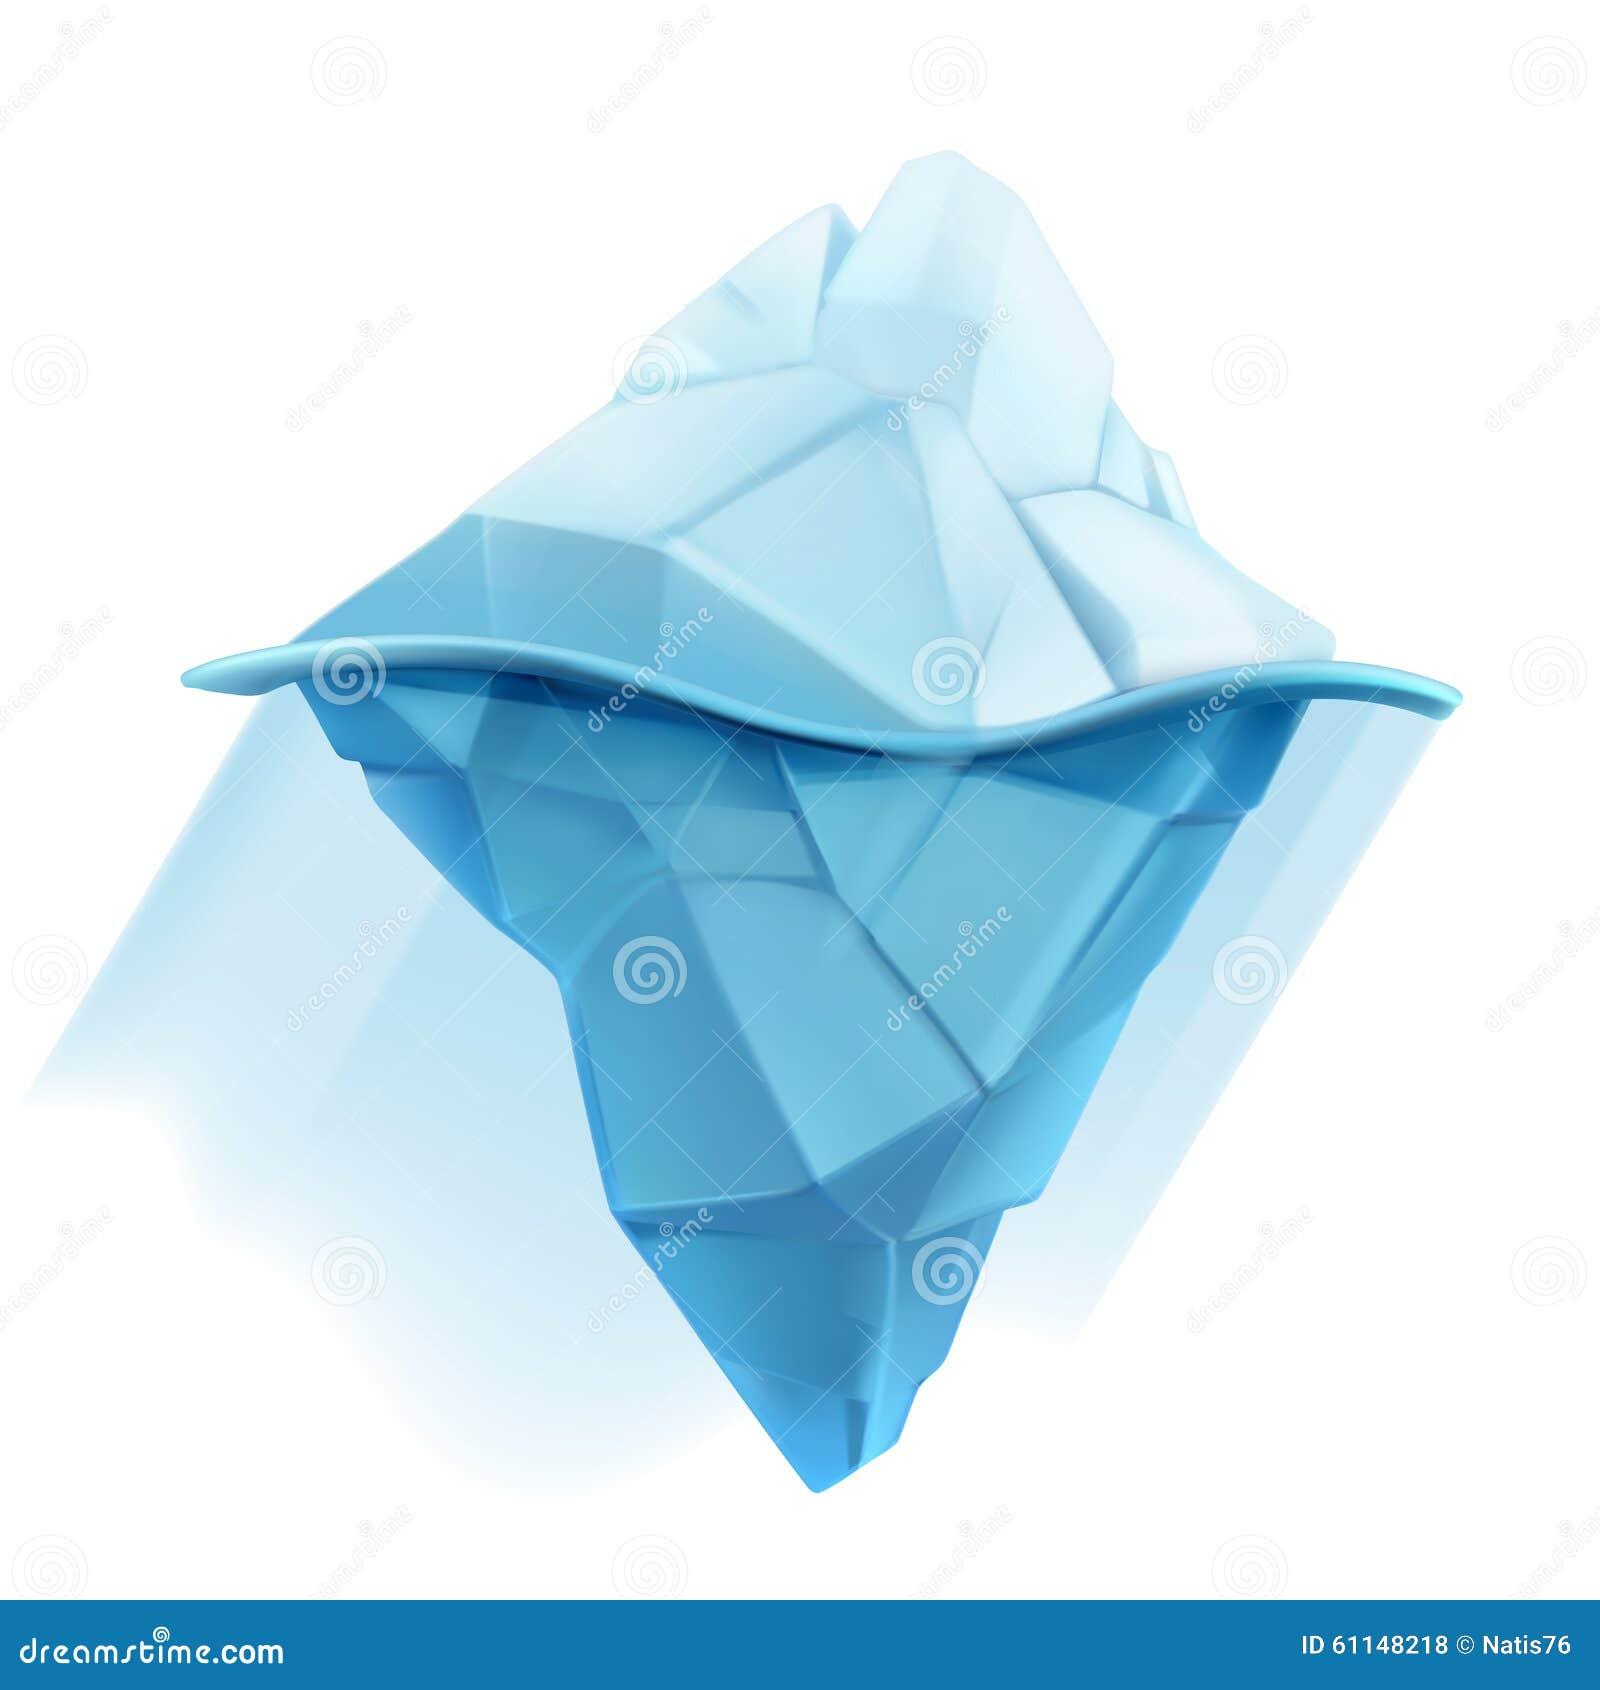 Iceberg Vector Icon Stock Vector - Image: 61148218